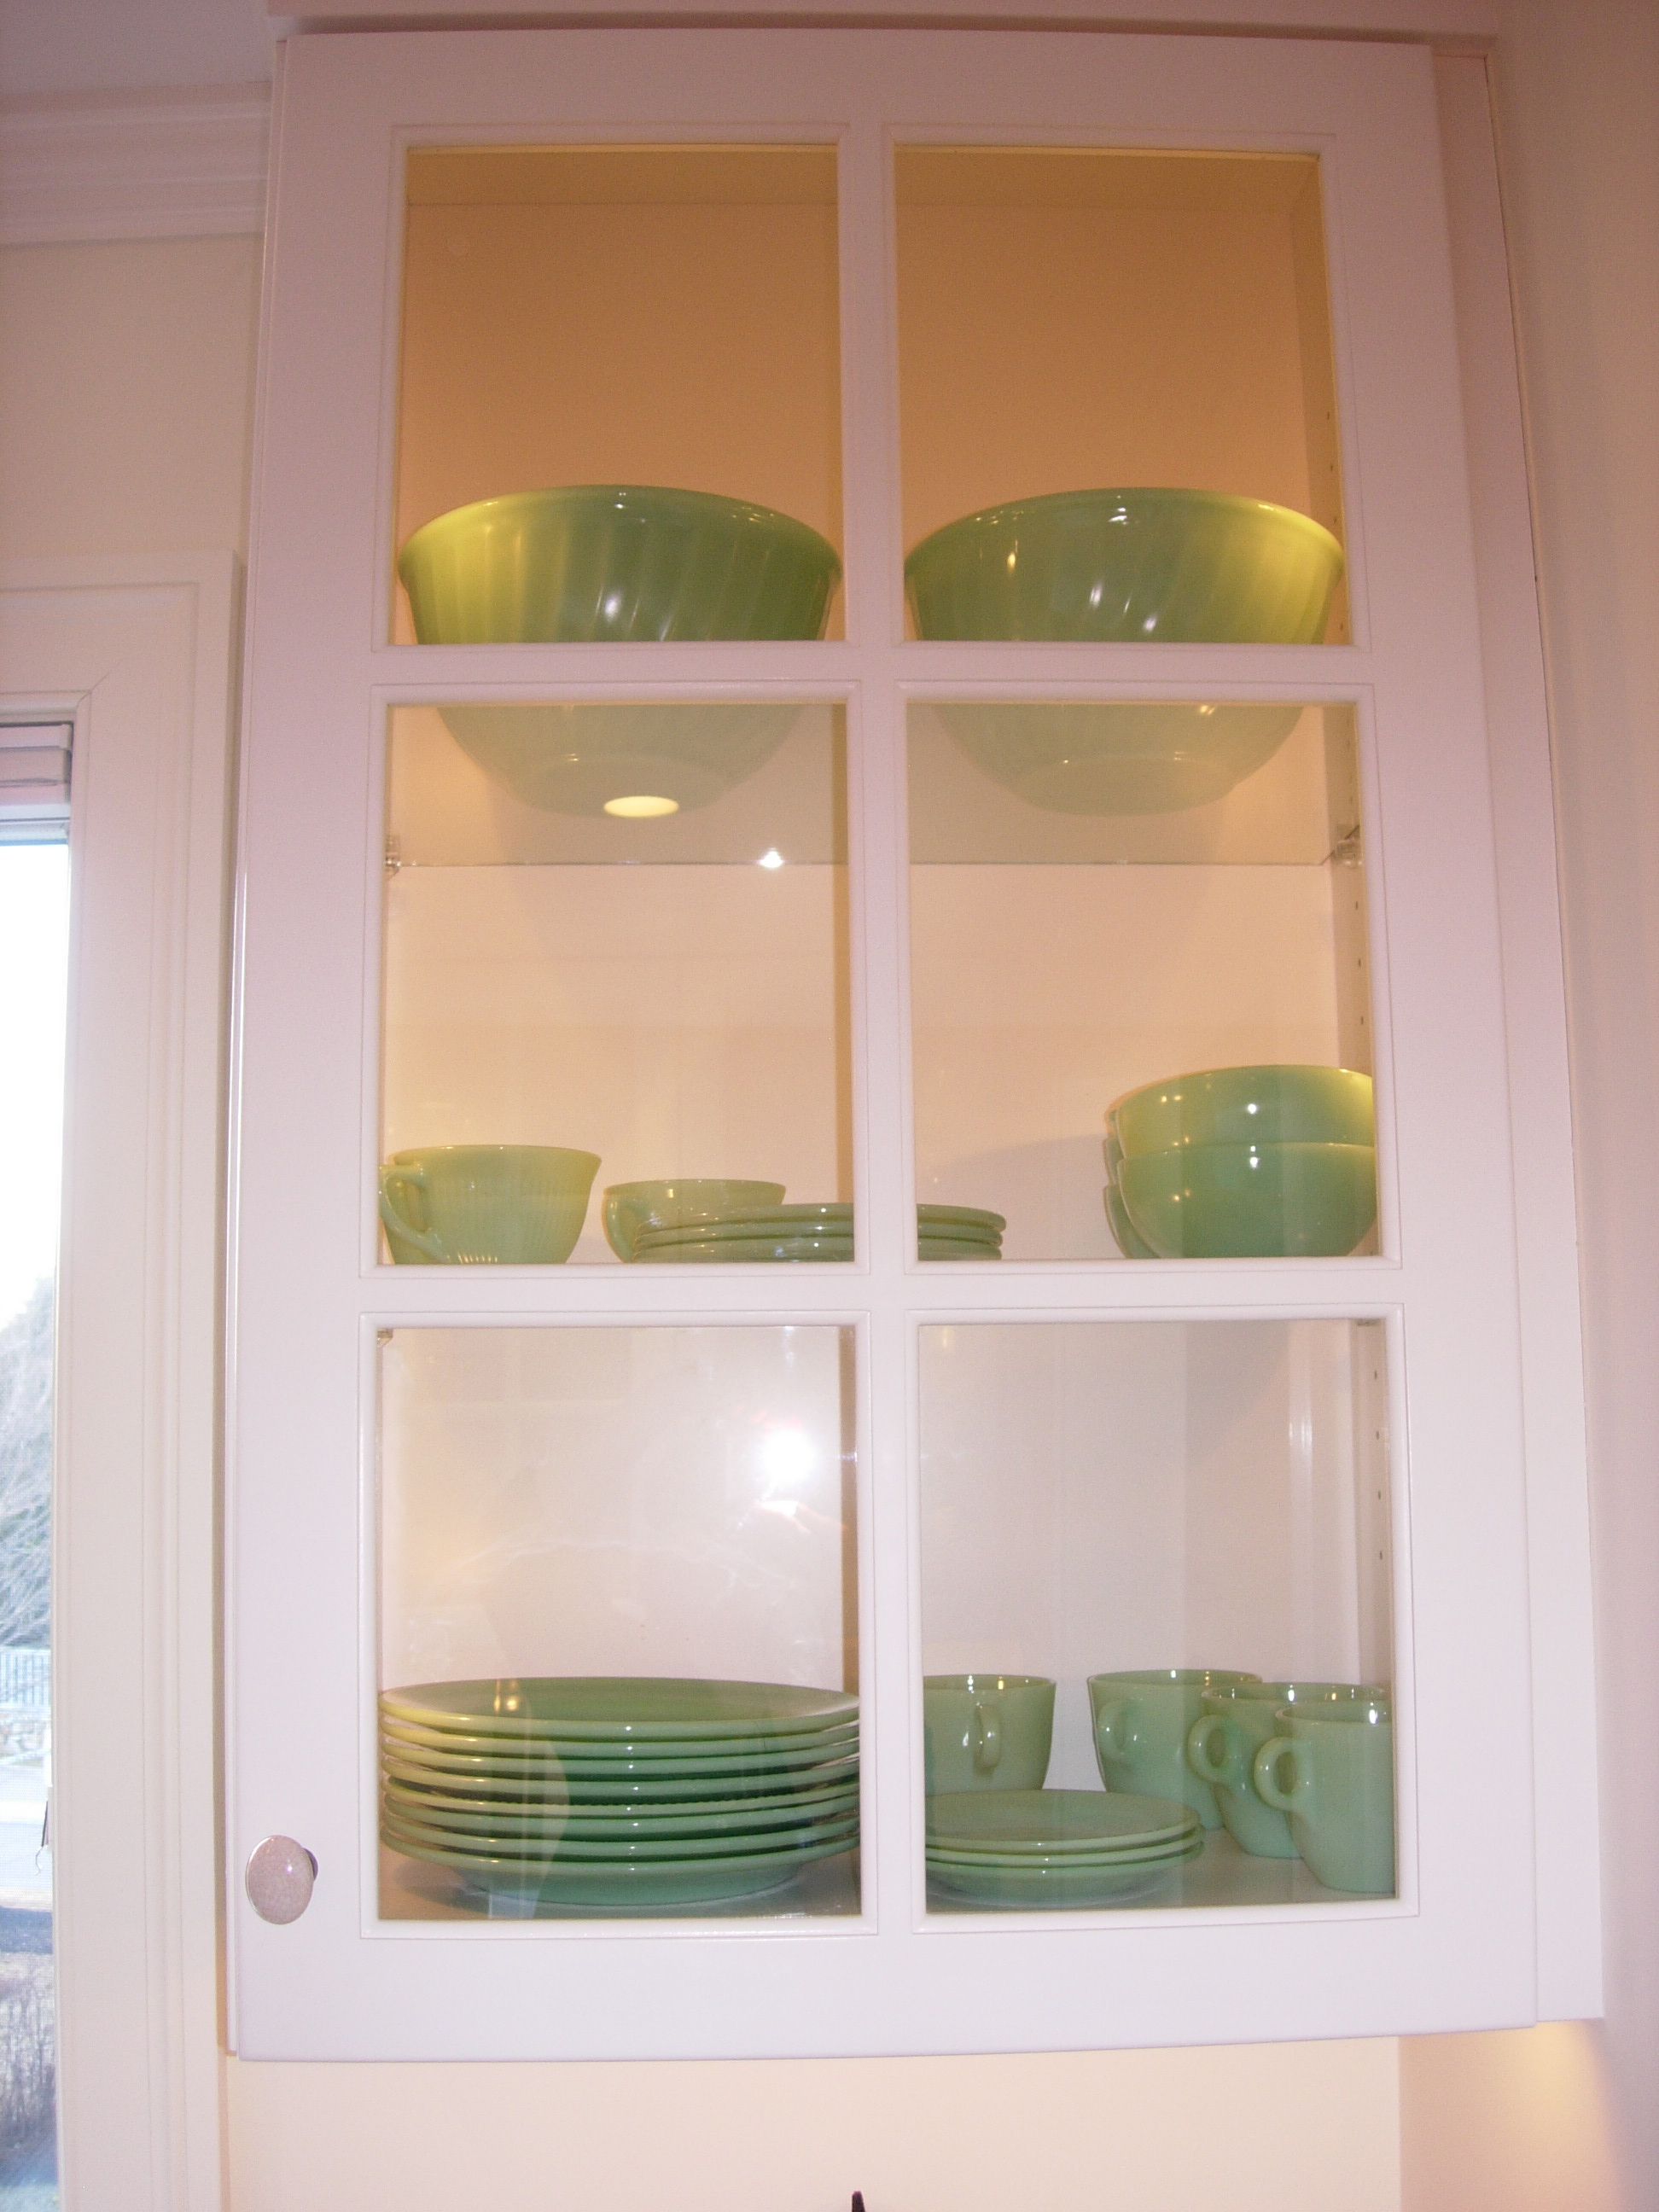 kitchen cabinet manufacturers list cupboards for sale greenlightingpartner's blog | just another wordpress.com site